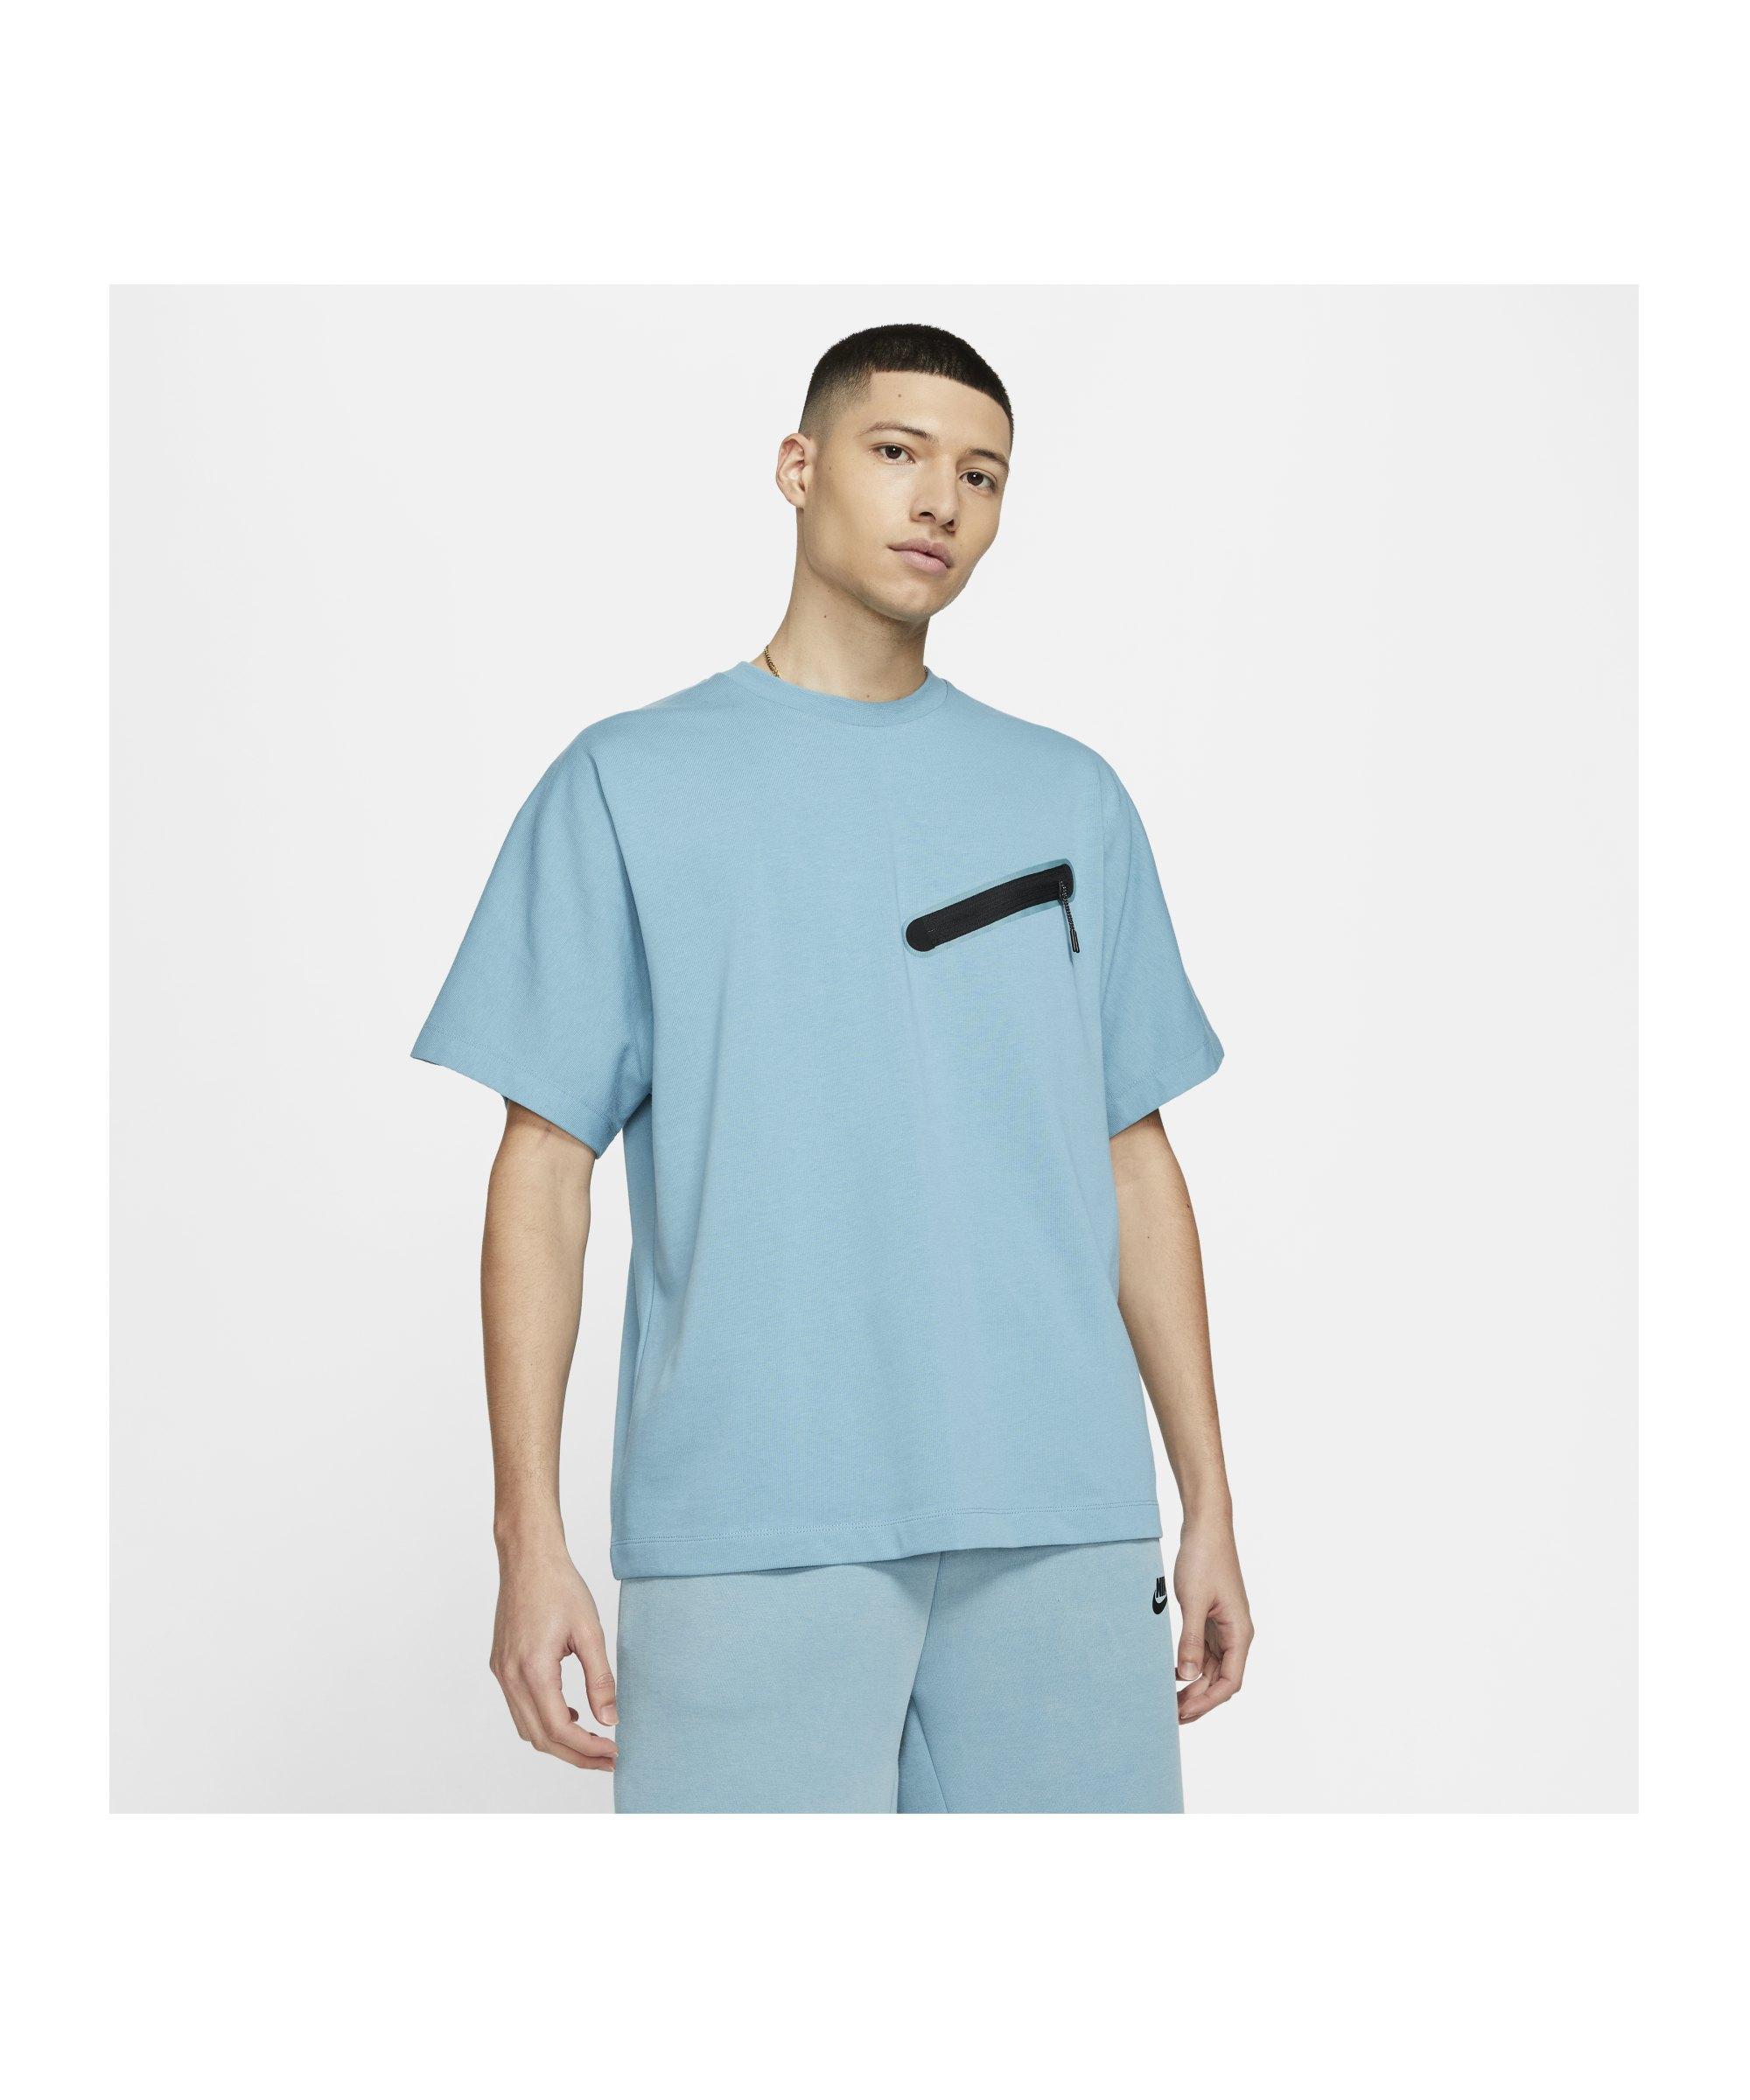 Nike Knit T-Shirt Blau F424 - blau